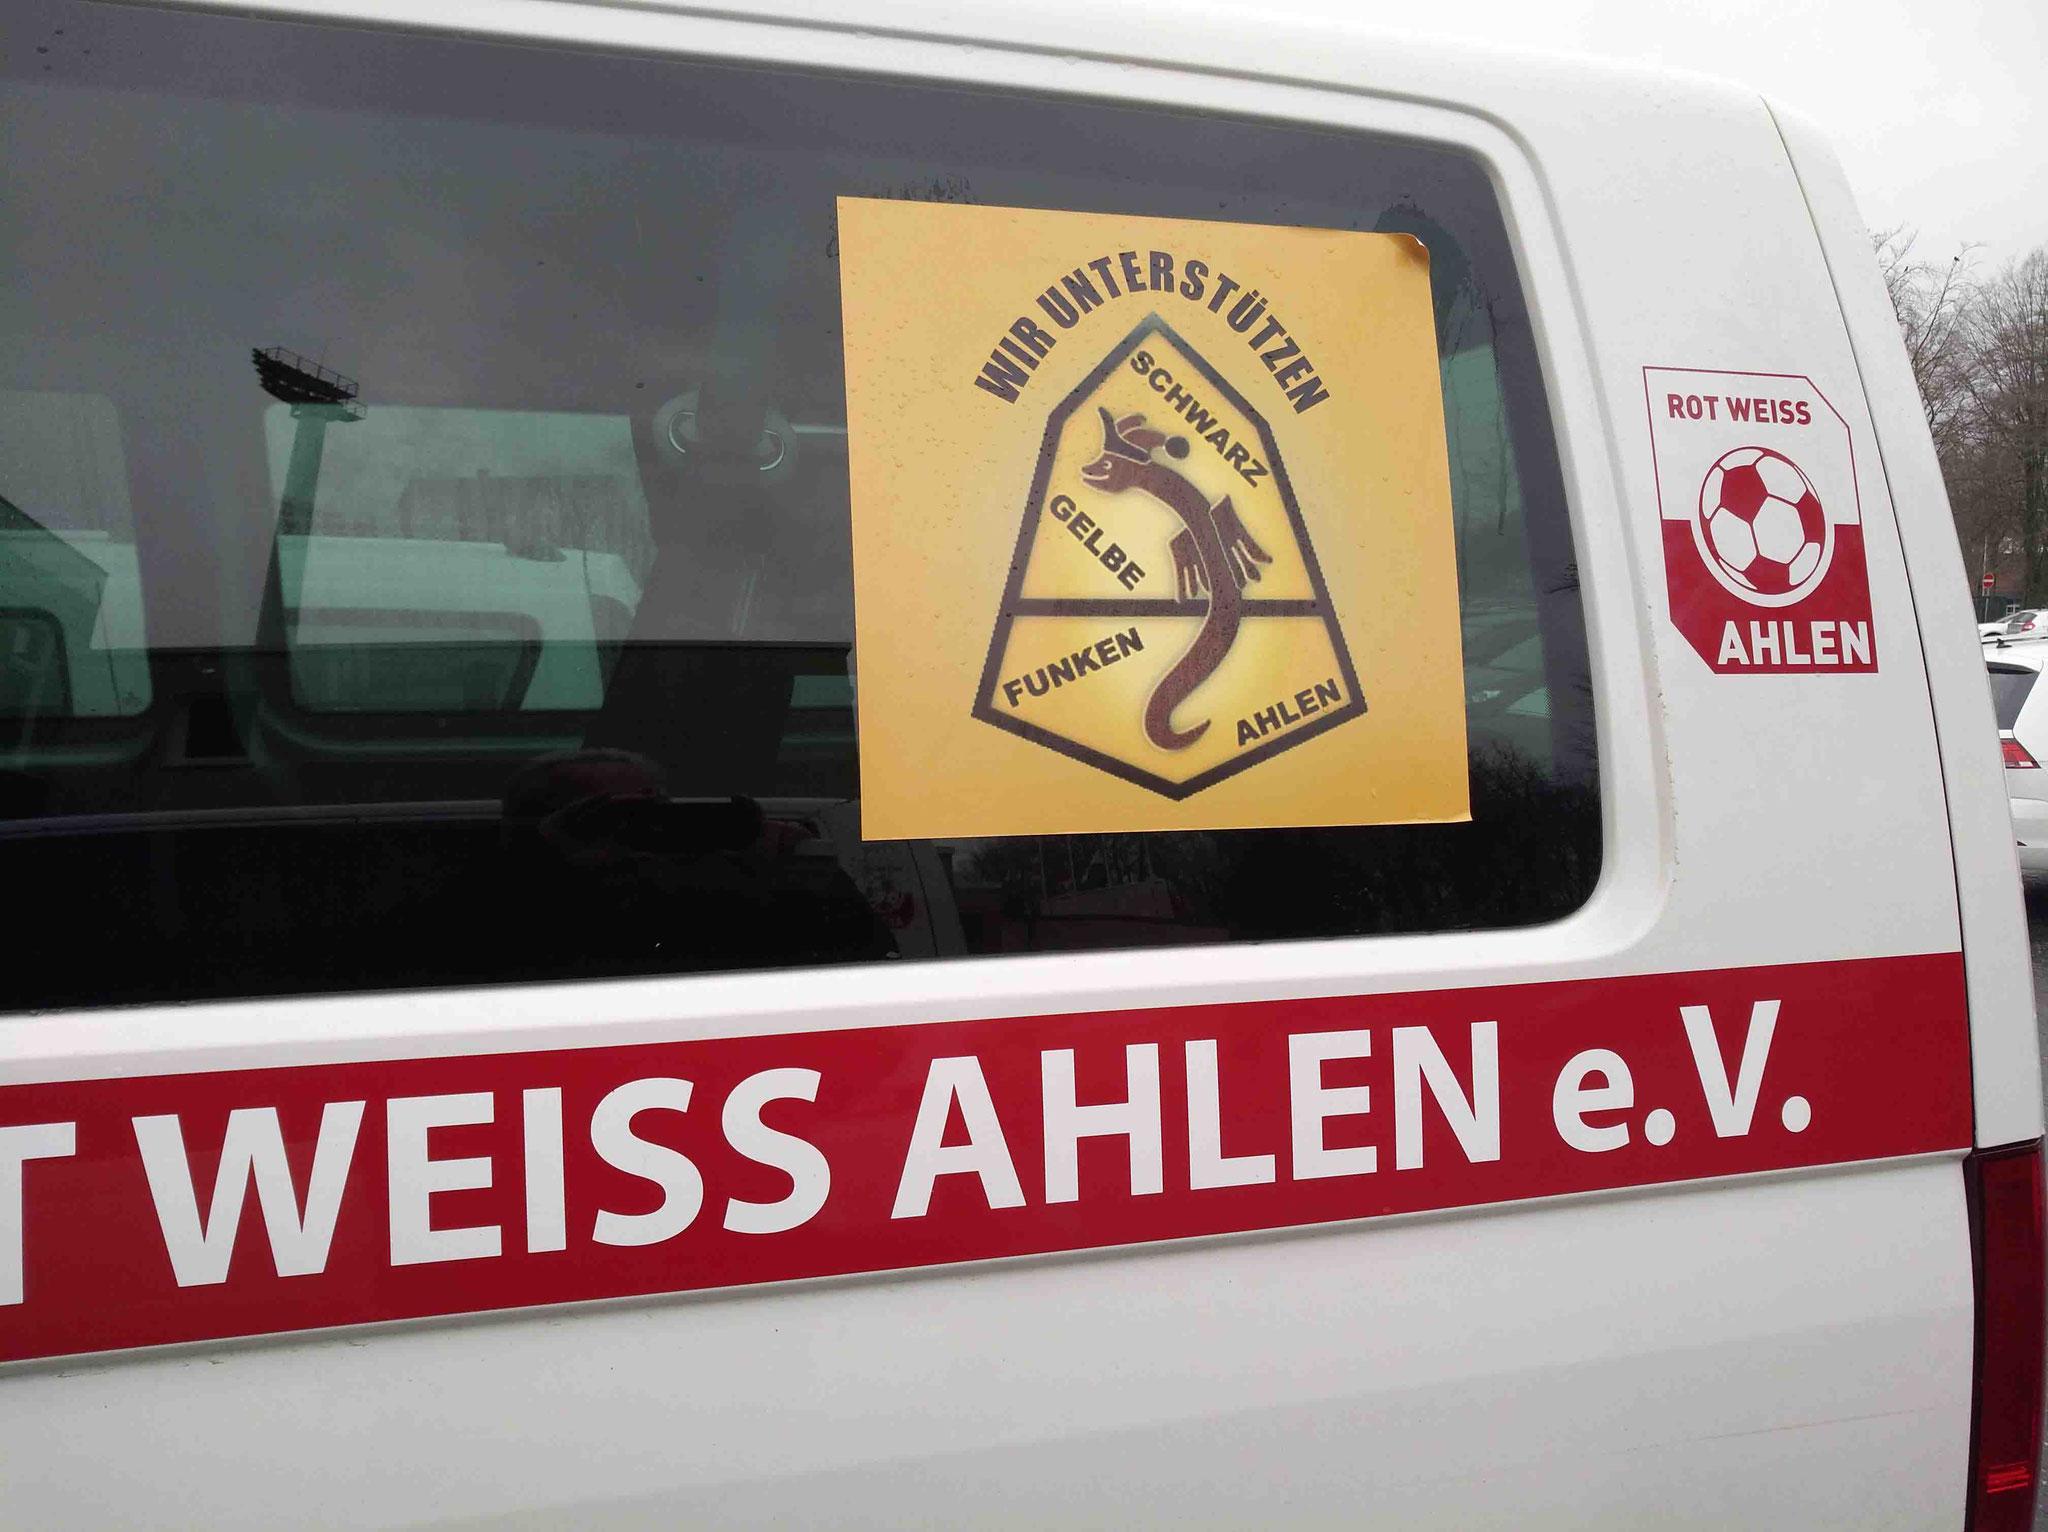 Ahlener Karnevalsgesellschaft Schwarz-Gelbe-Funken